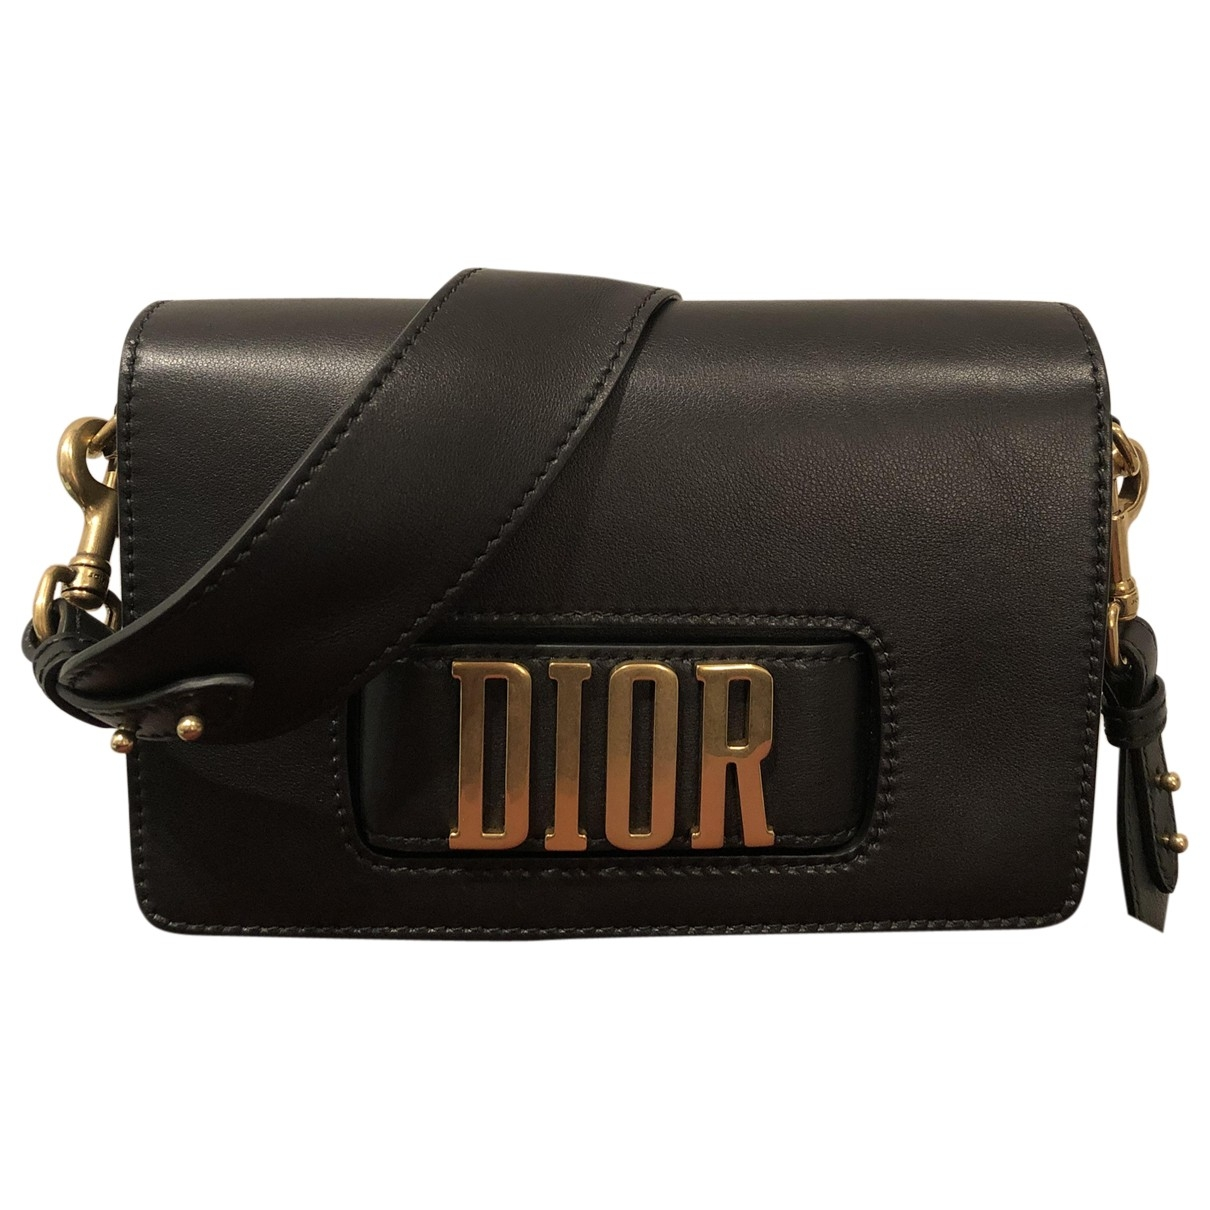 Dior Dio(r)evolution Black Leather handbag for Women \N